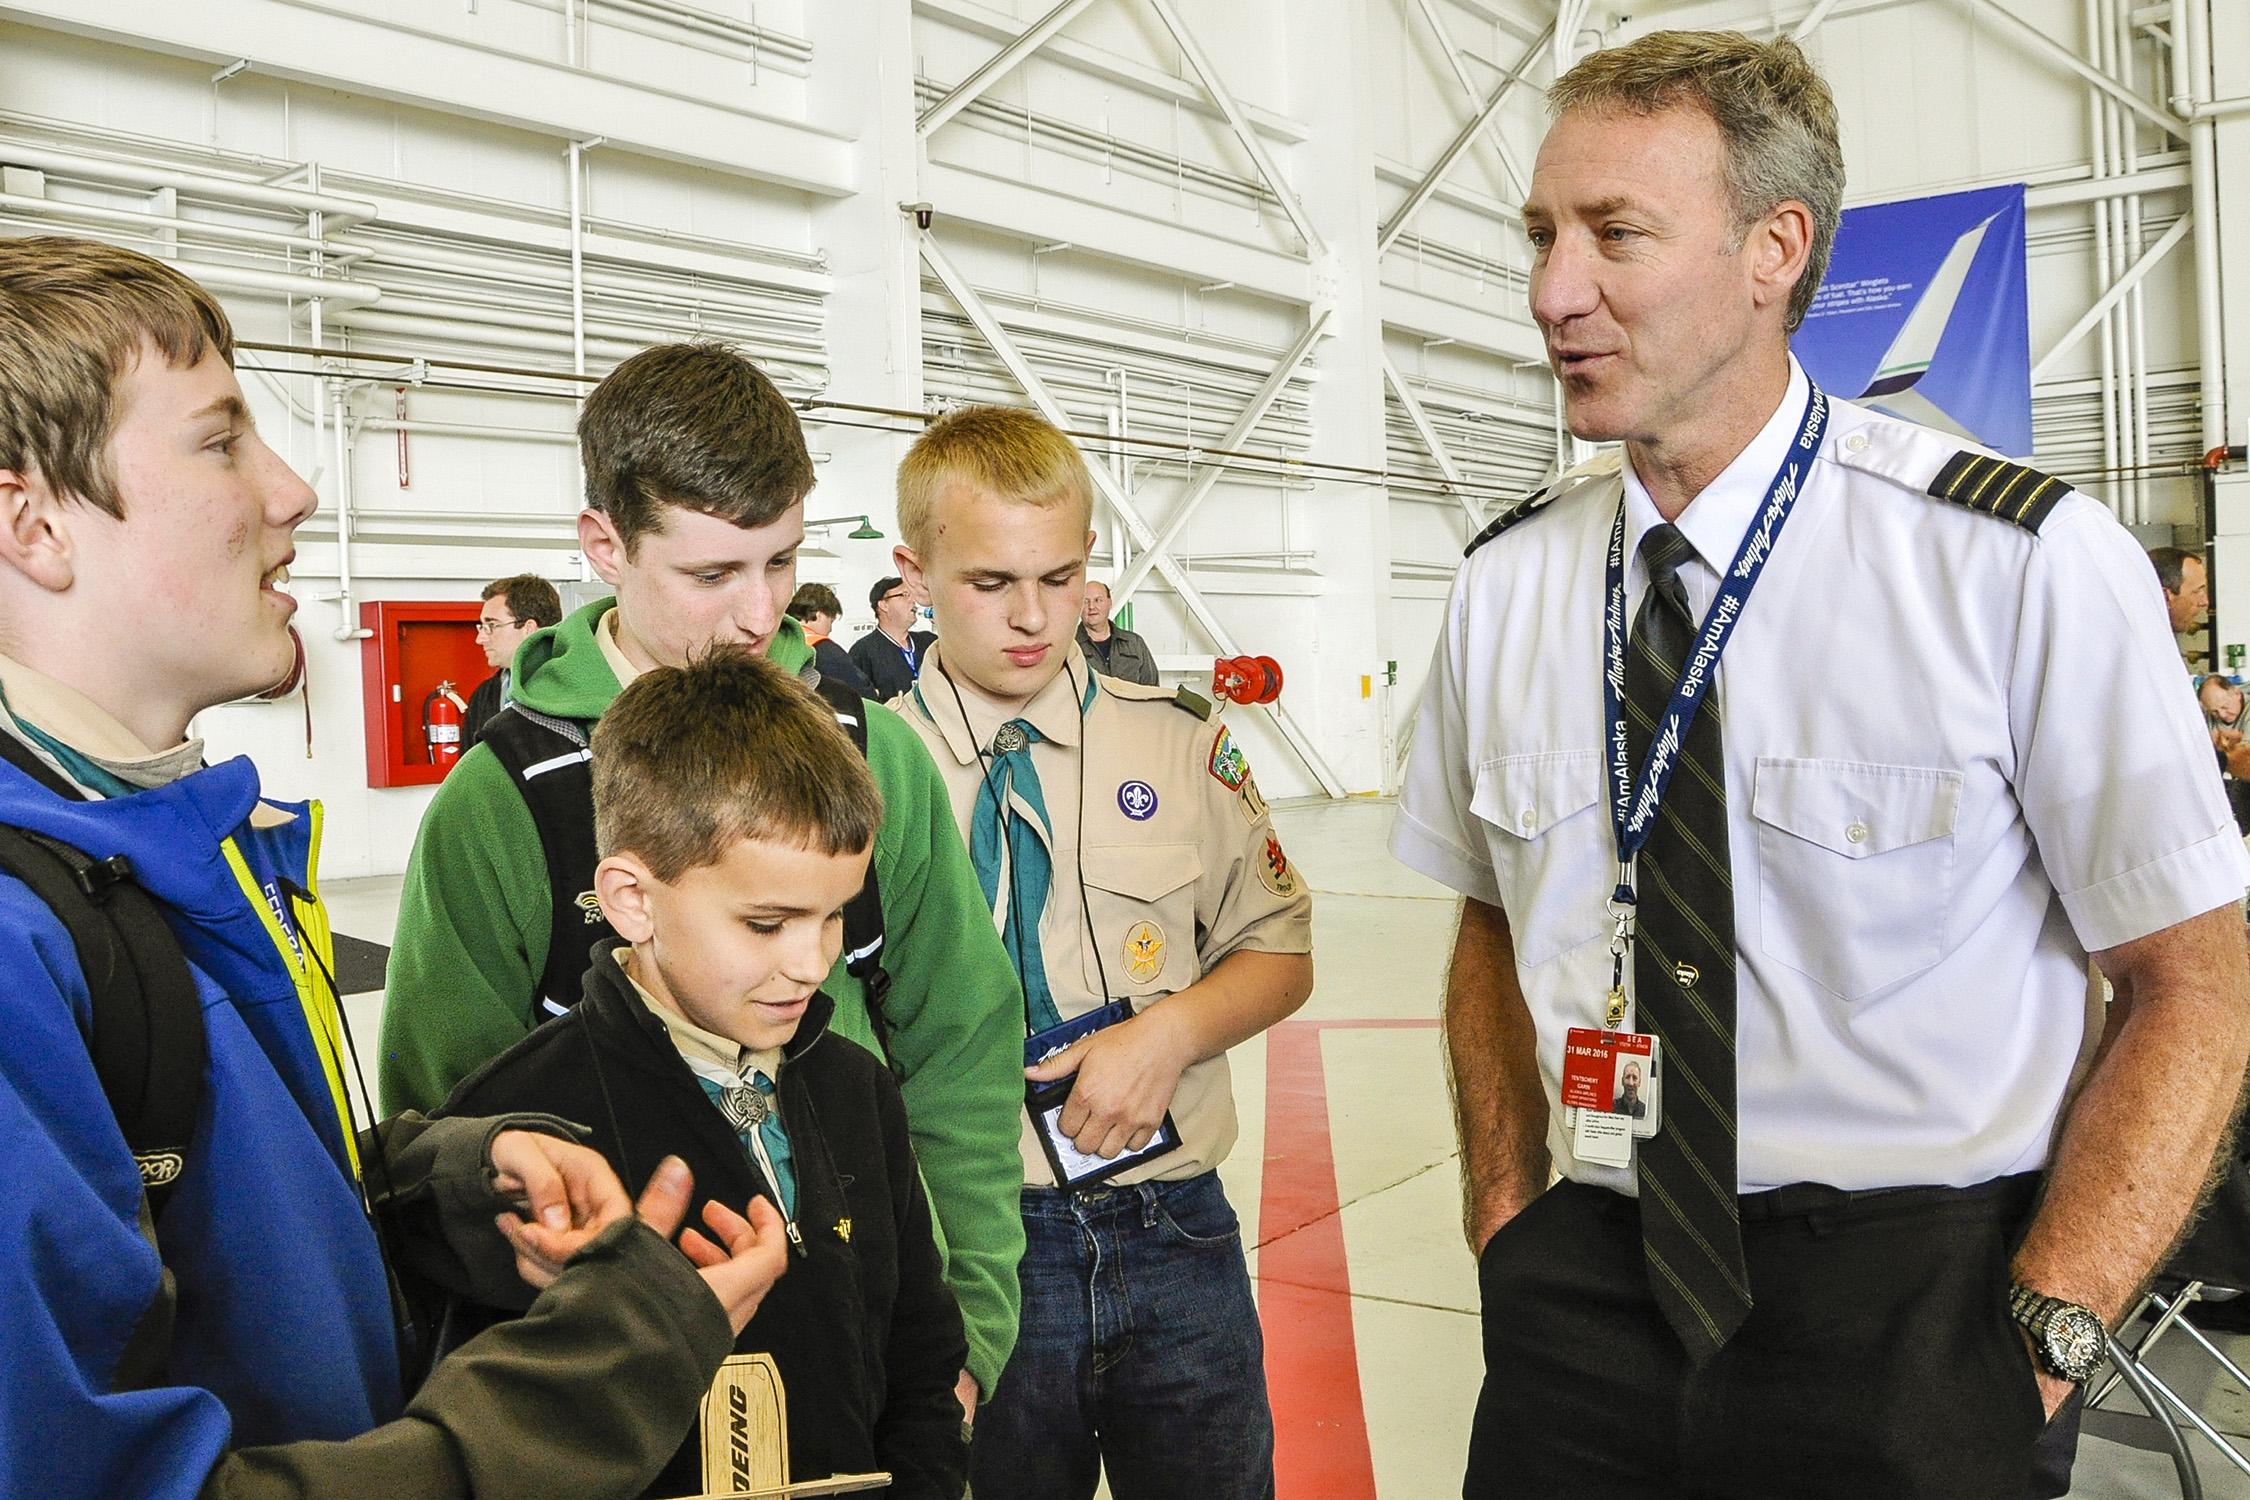 Life path gives C-17 pilot high careers with Alaska, Reserve (Part 2